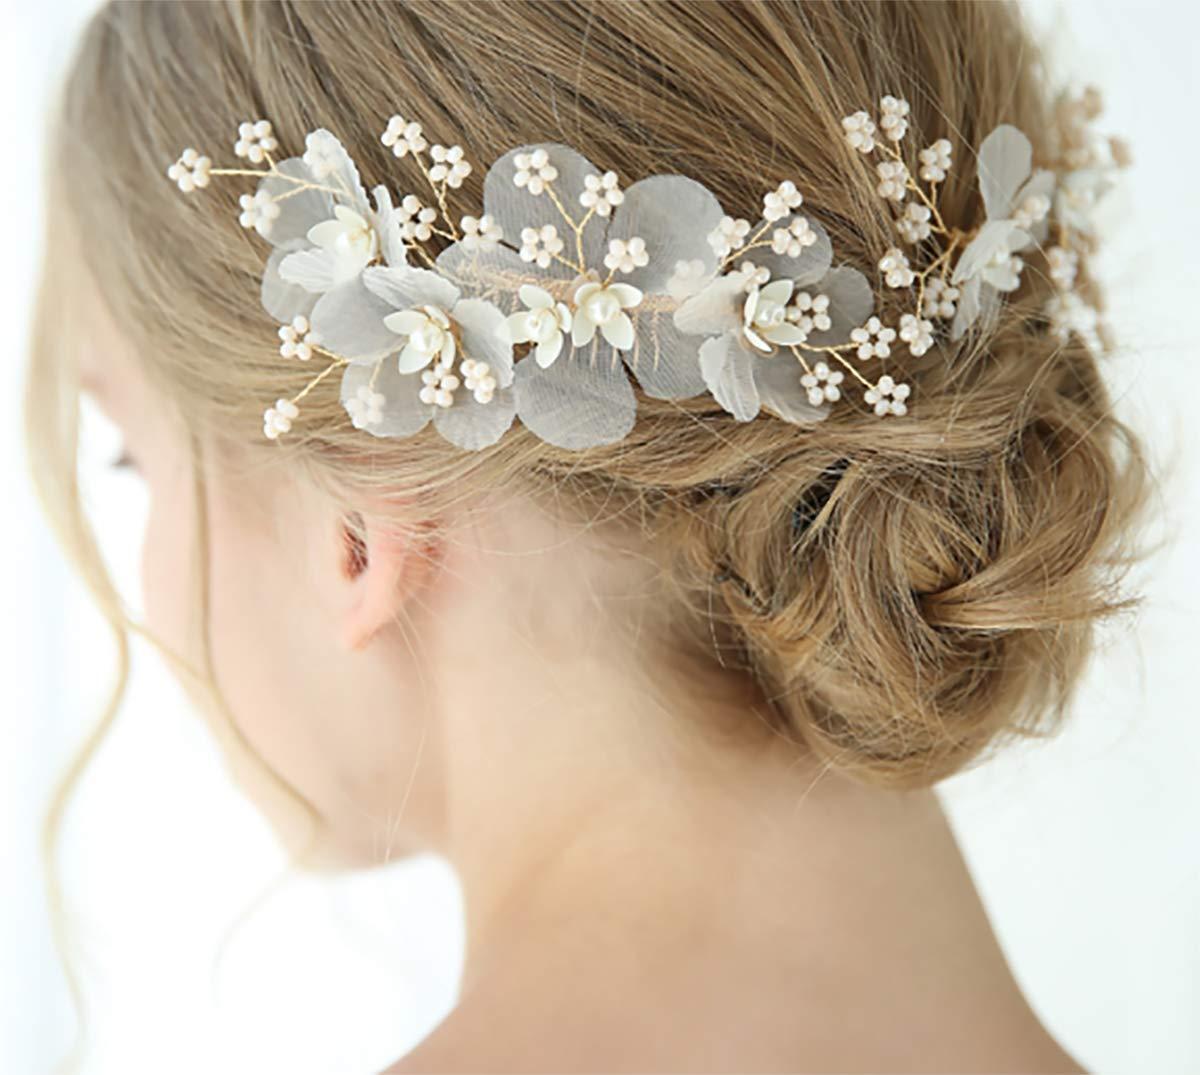 Chargances Bride 3pcs Floral Hair Pin Comb Wedding Overseas parallel import Max 46% OFF regular item Hai Gold